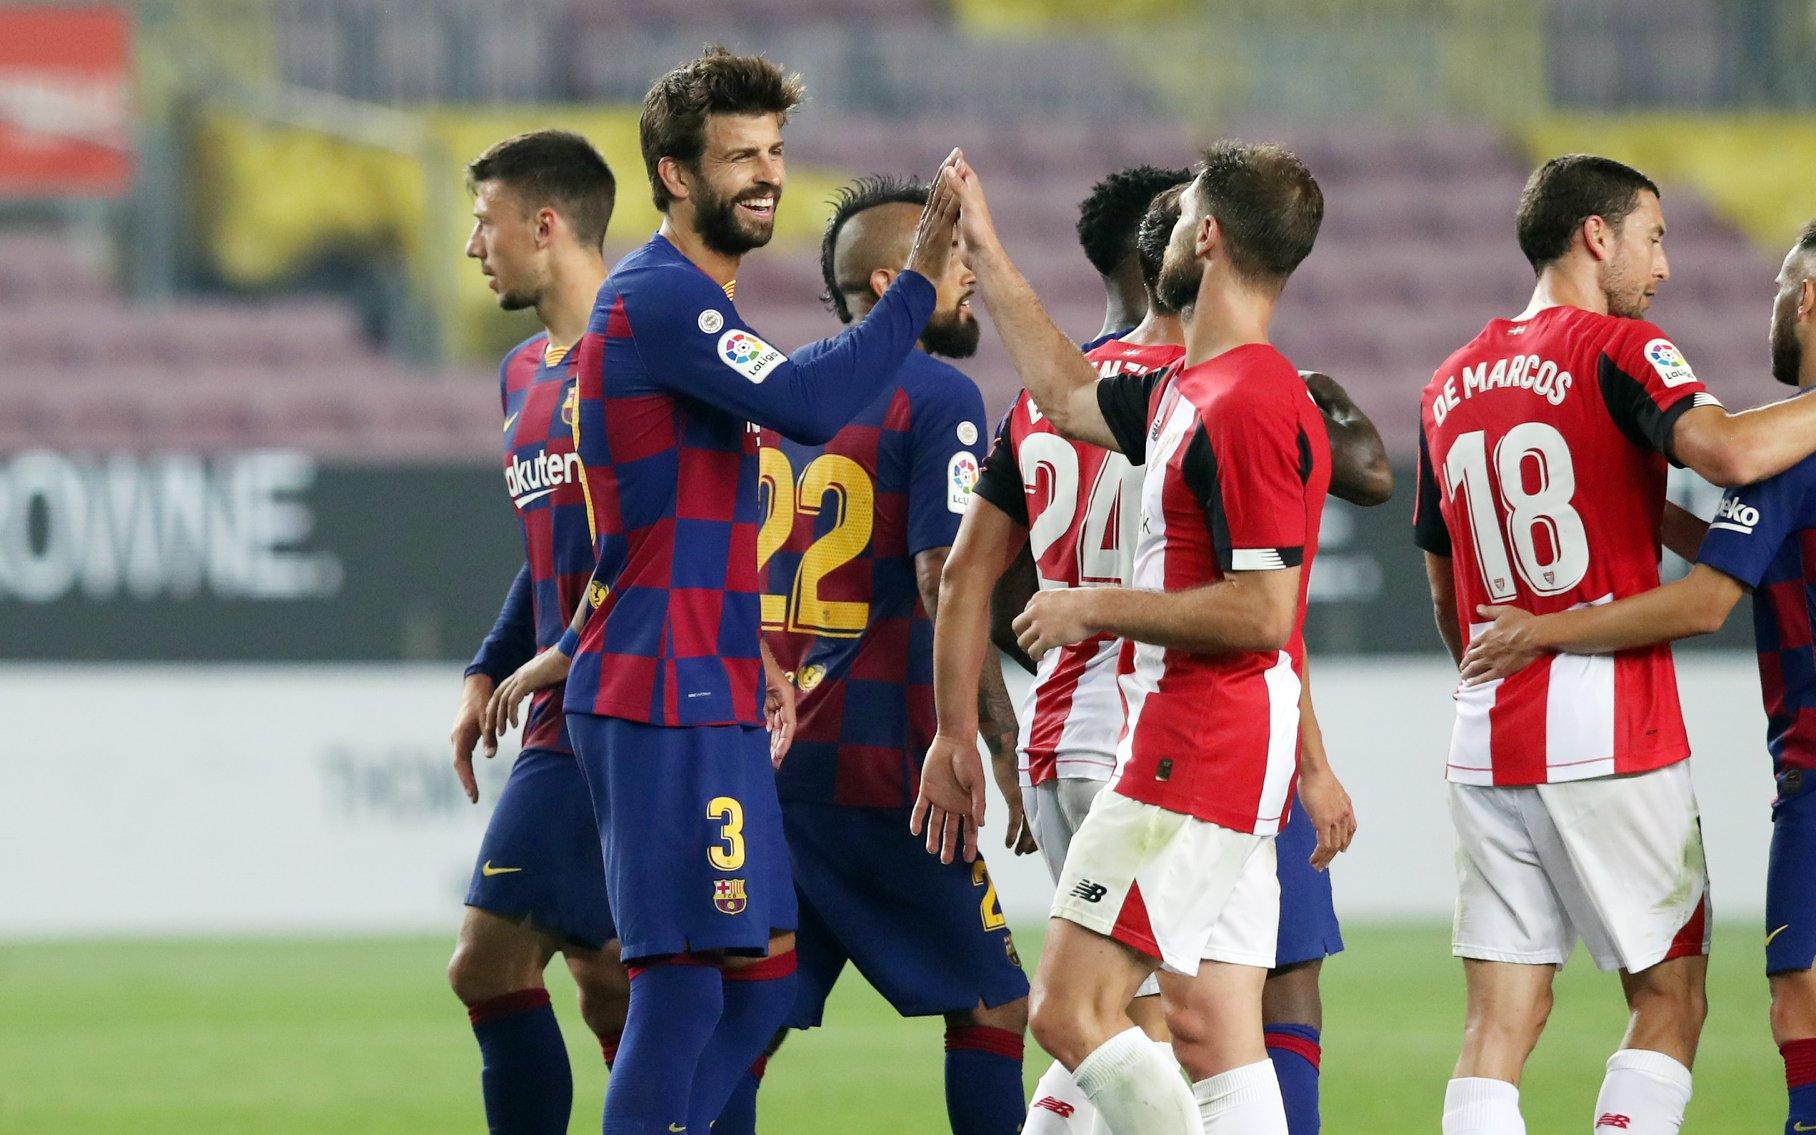 soi-keo-barcelona-vs-espanyol-vao-3h-ngay-9-7-2020-1